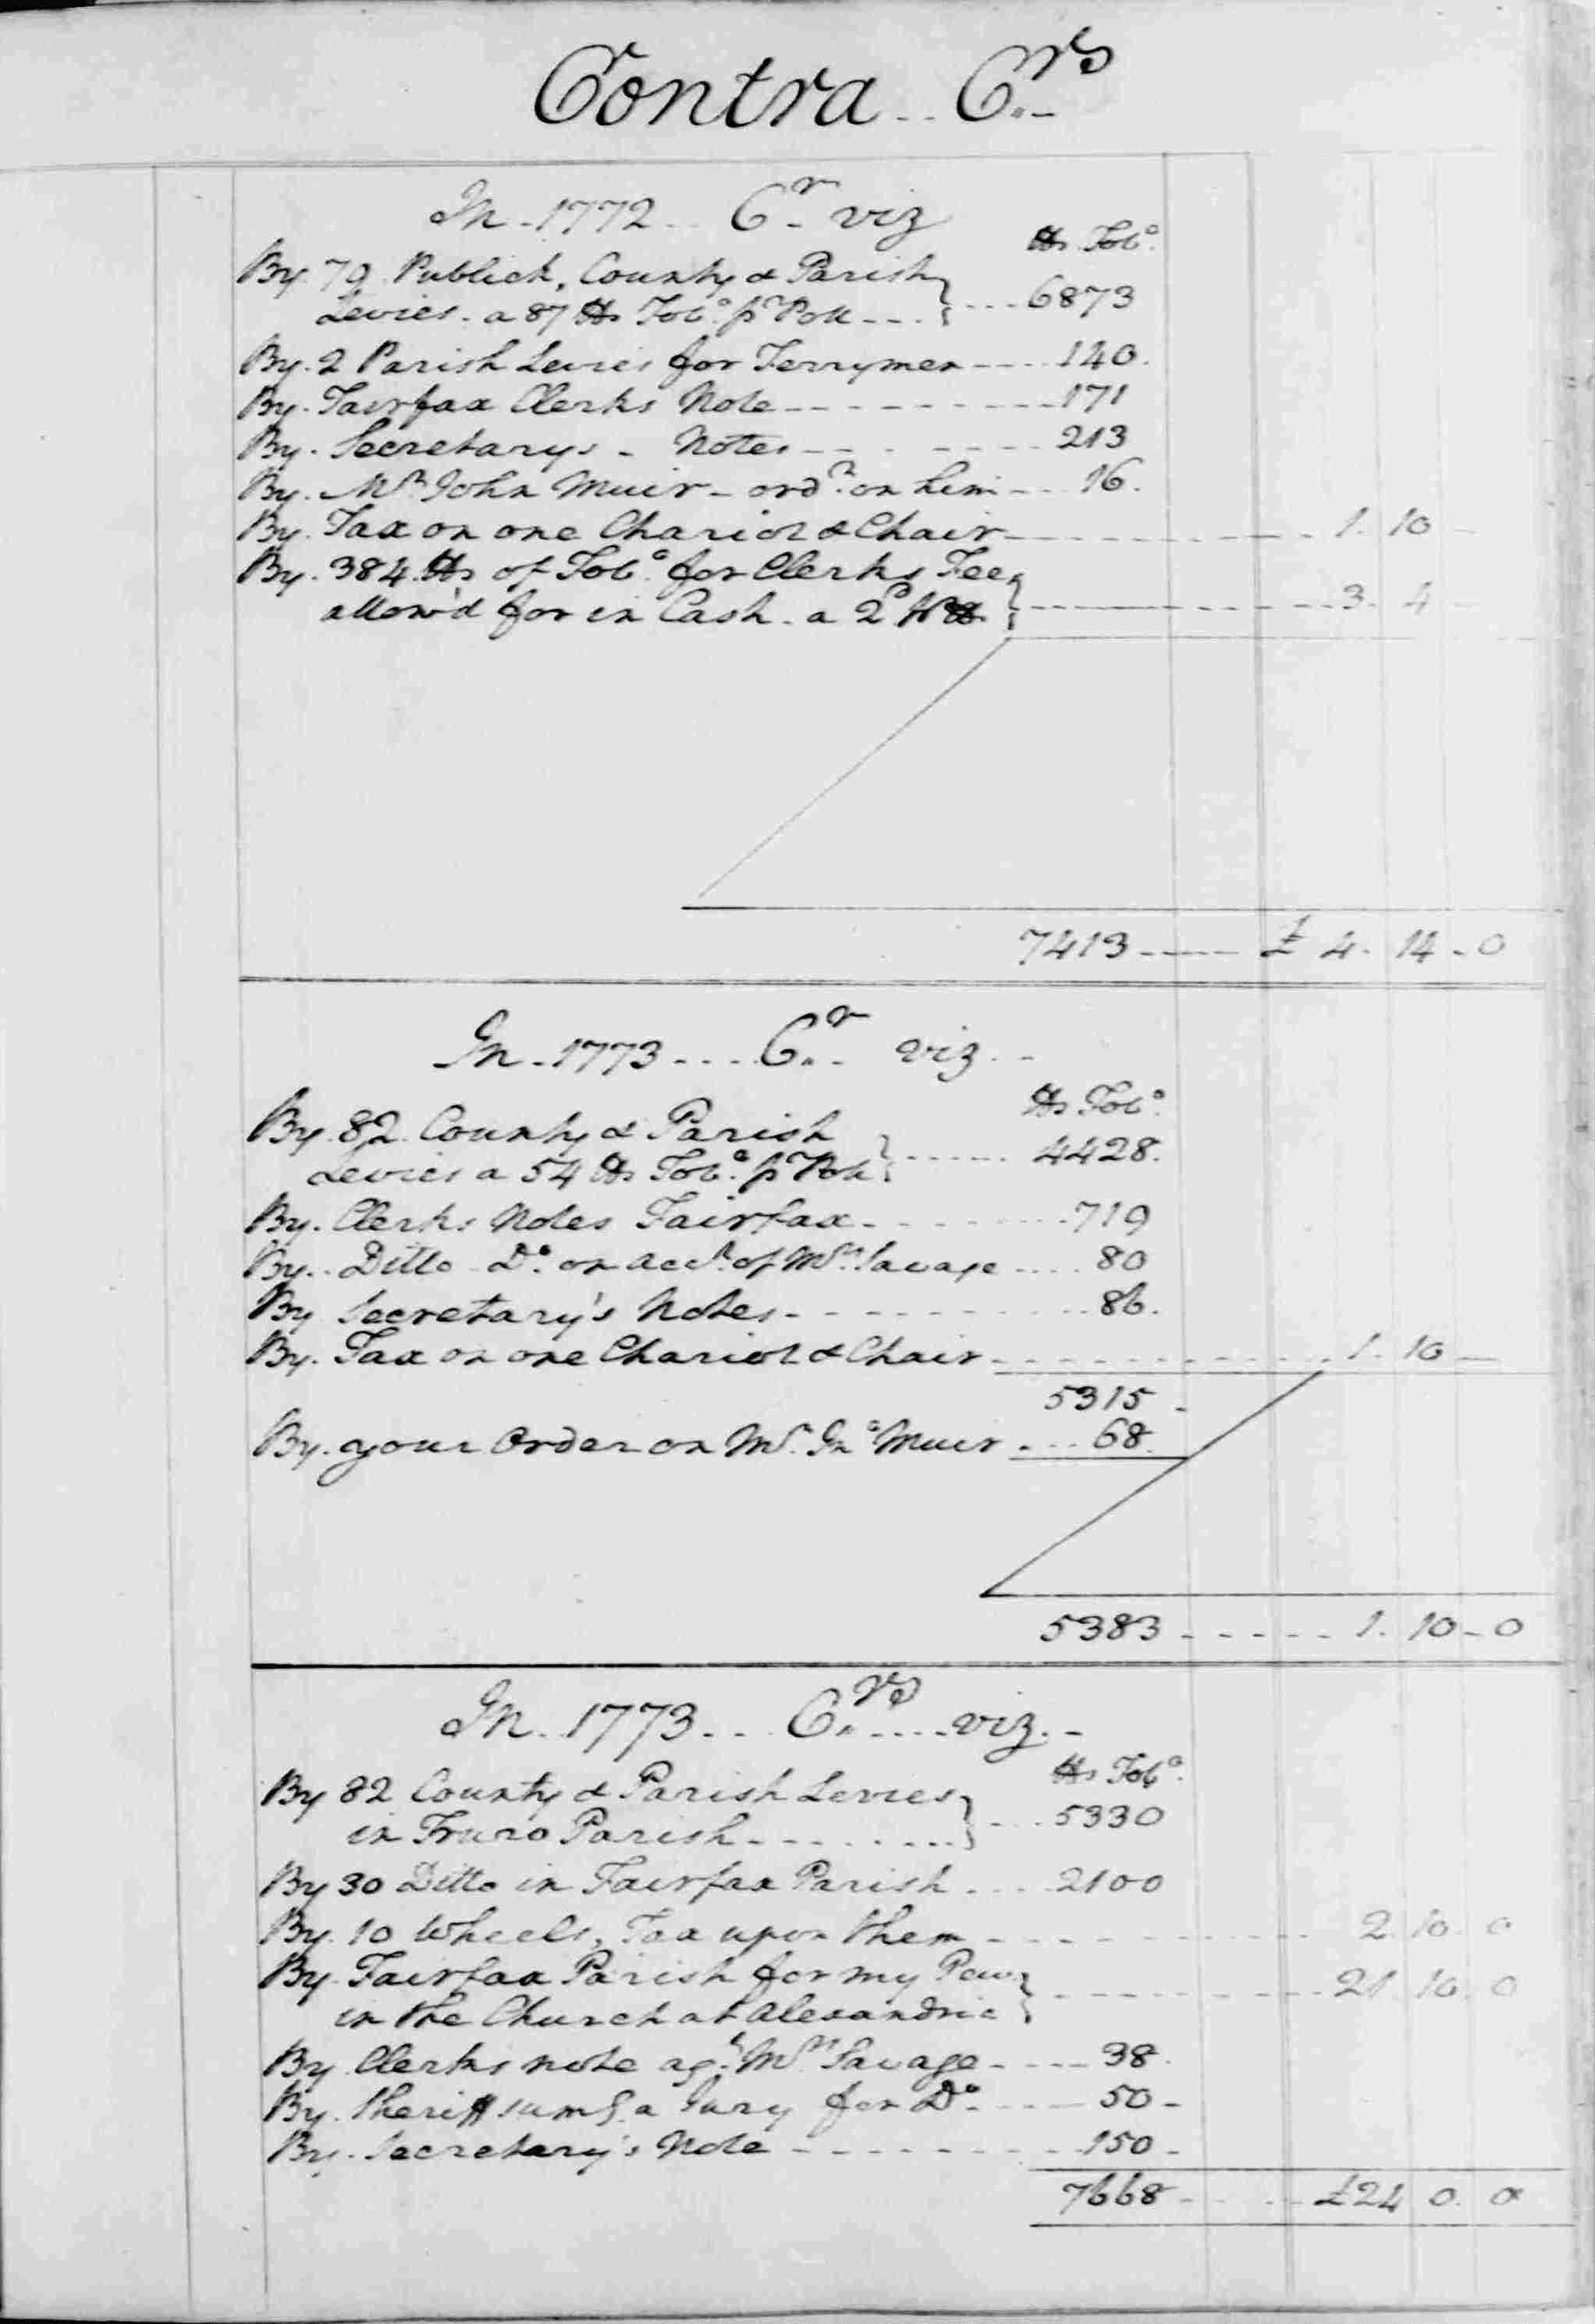 Ledger B, folio 54, right side